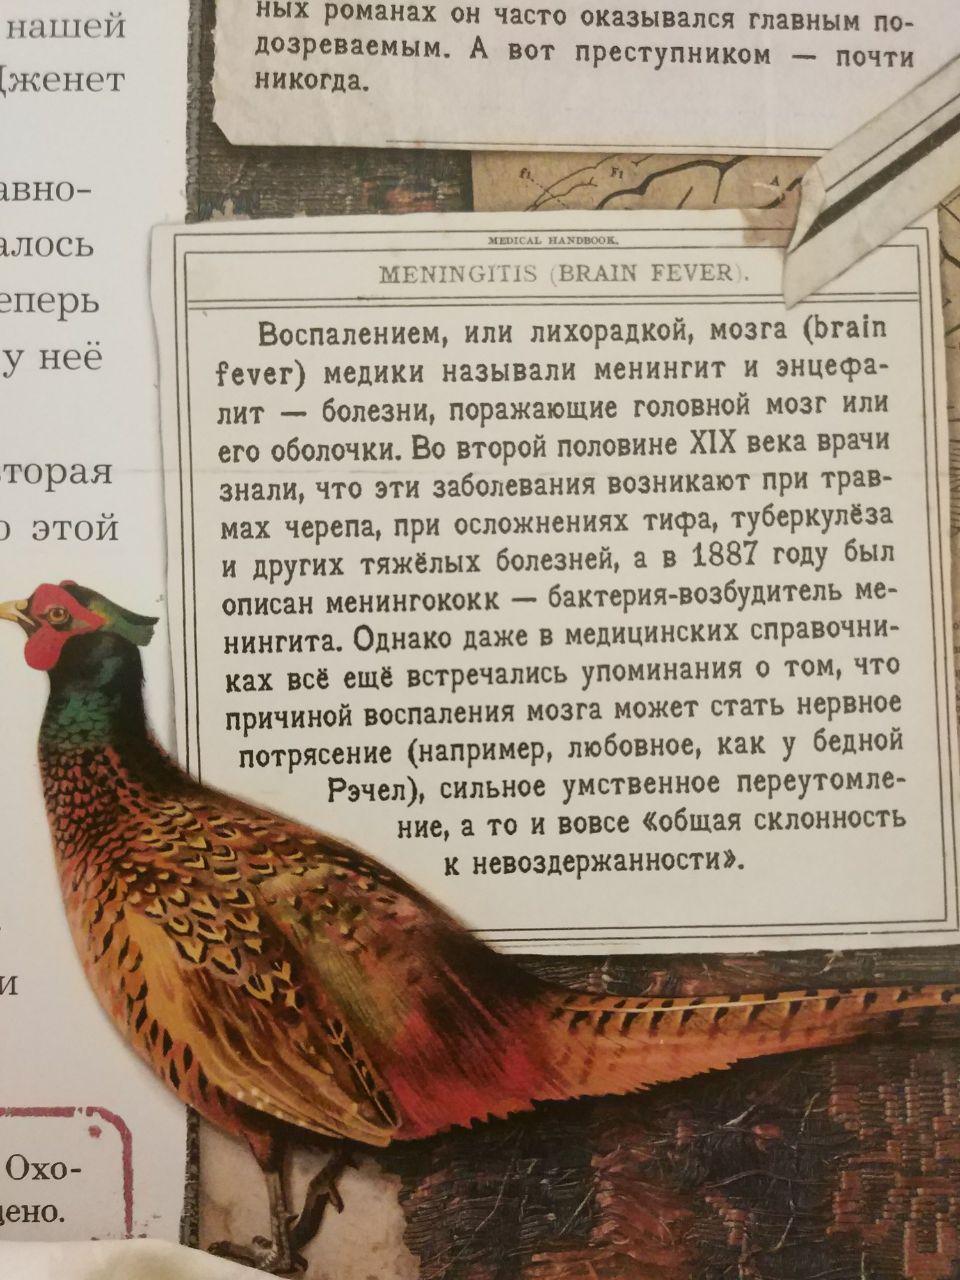 http://s5.uploads.ru/f0gX8.jpg